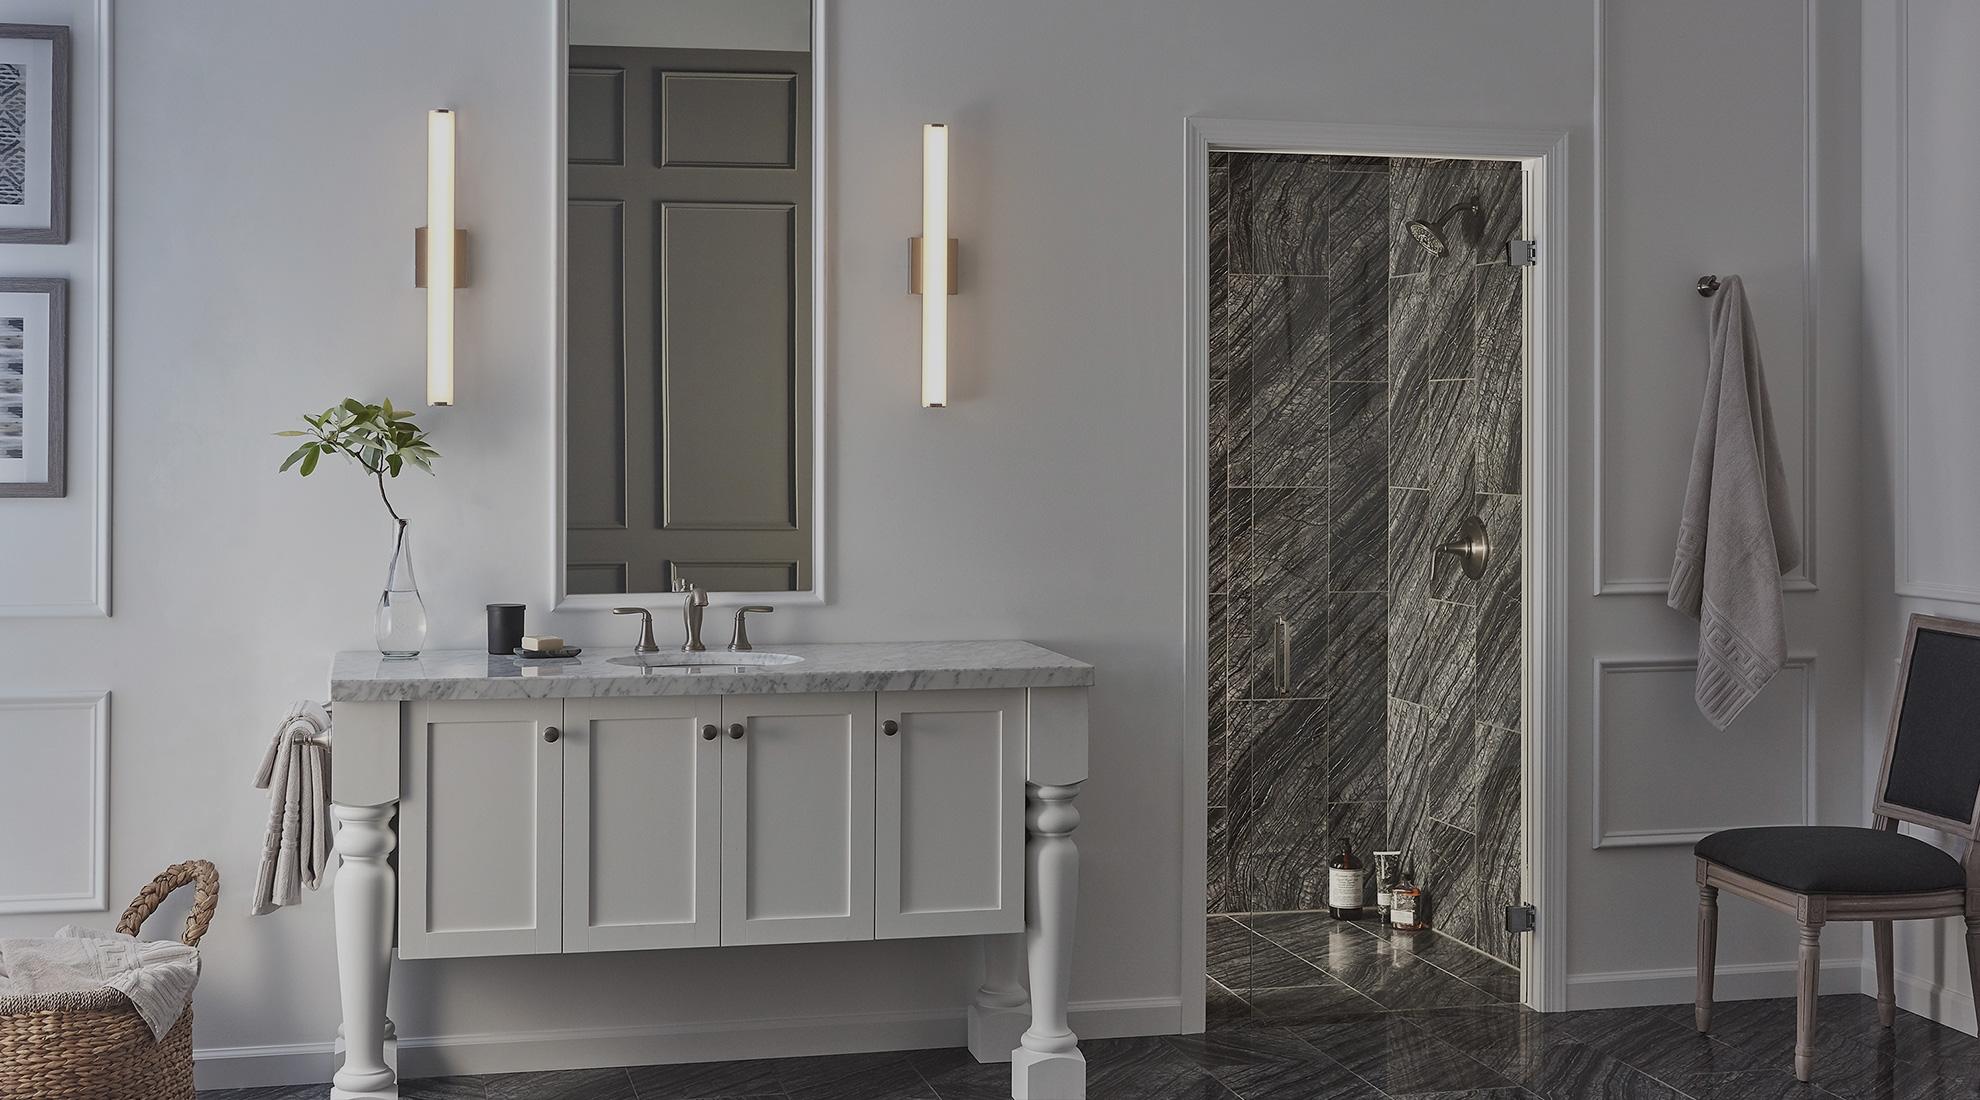 Make your bathroom comfortable through organization and cool bathroom lighting